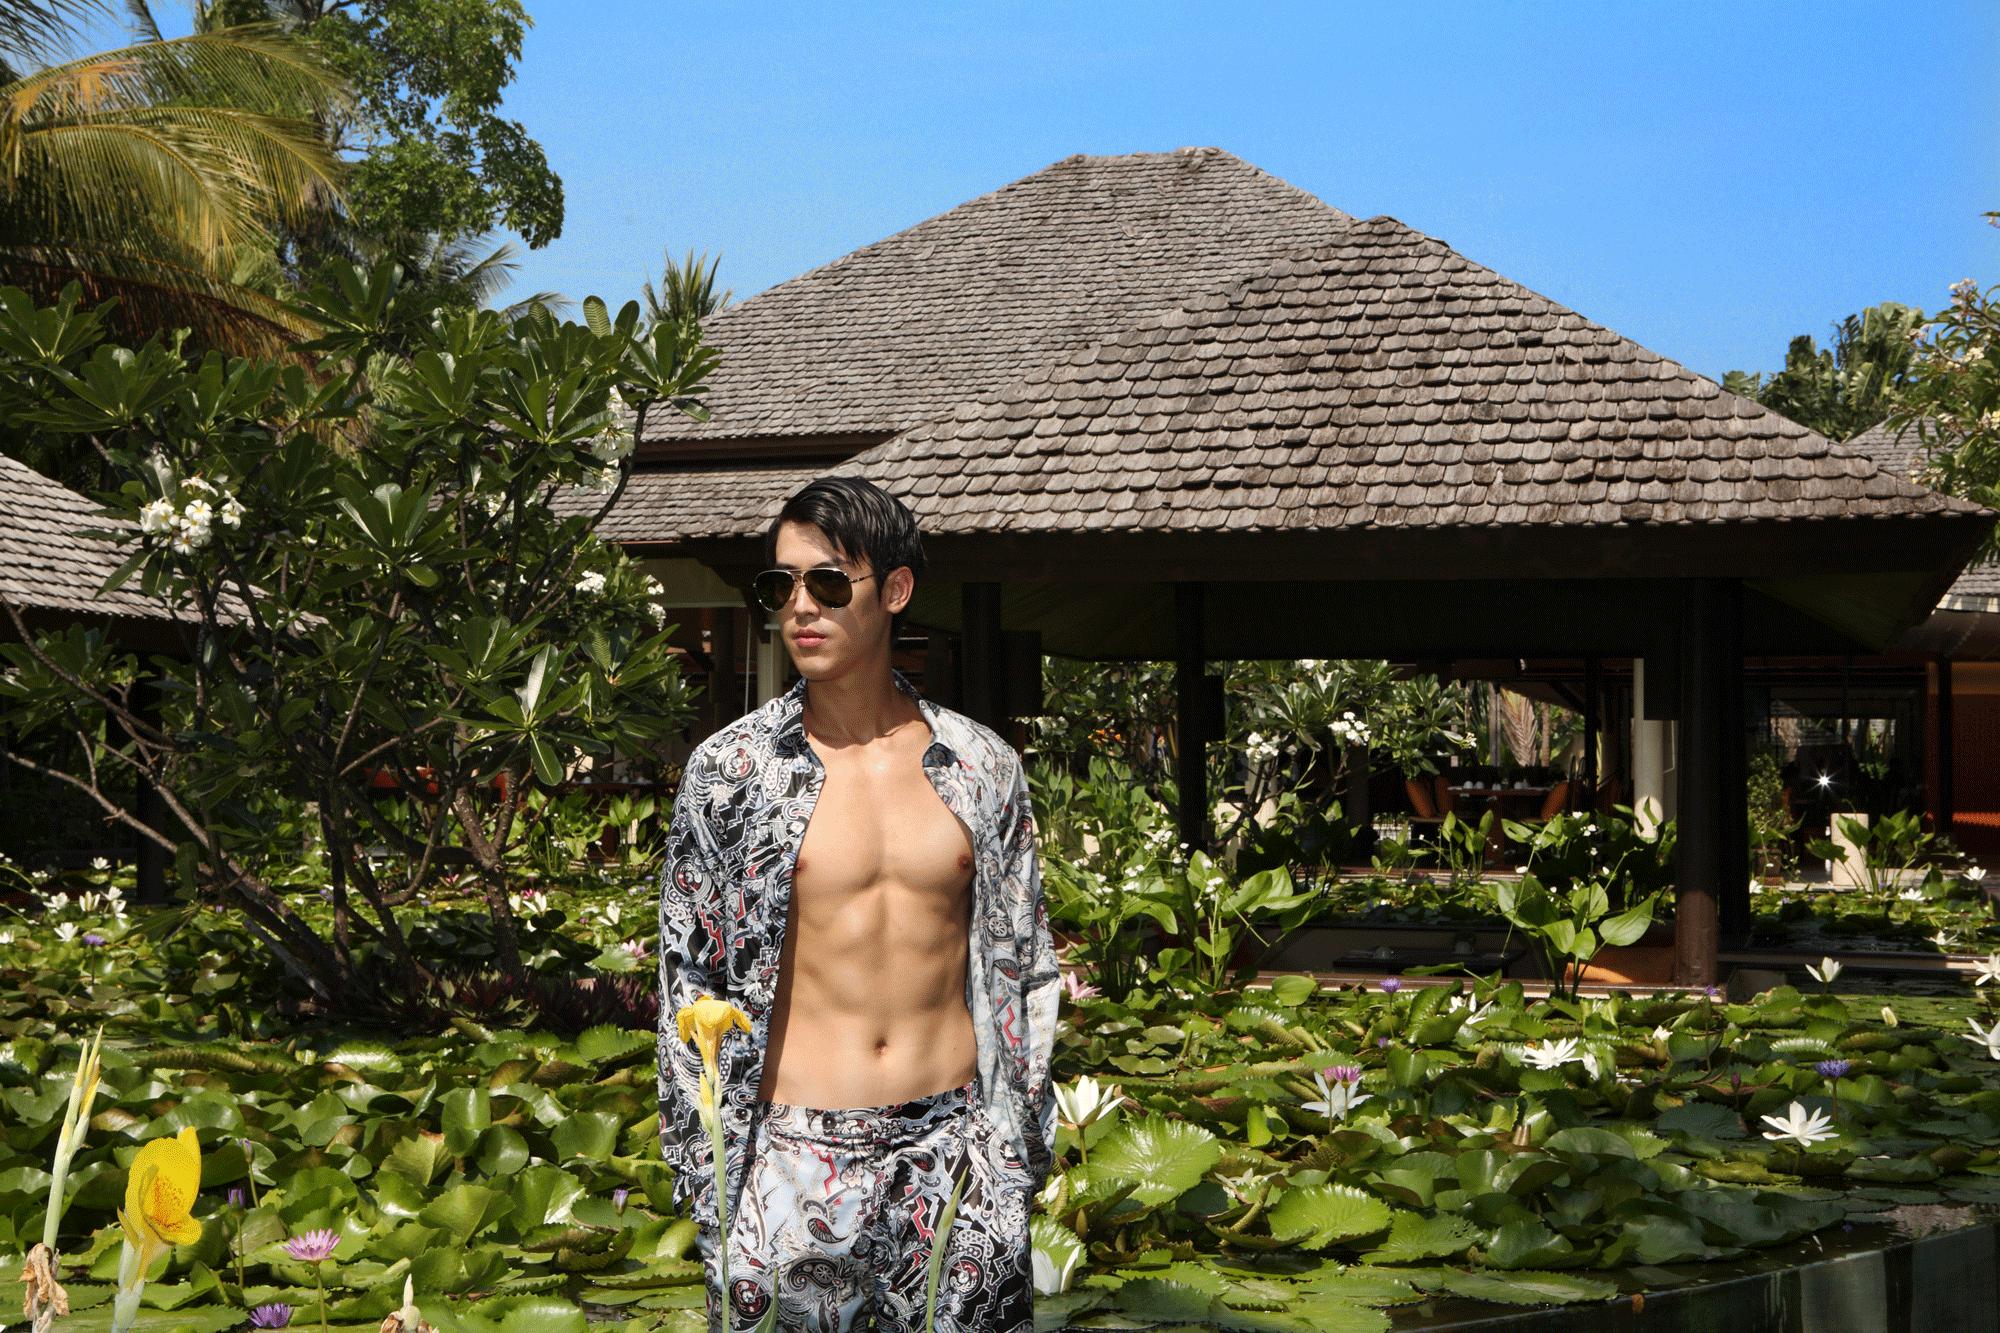 clothes : PAINKILLER / sunglasses : TAVAT